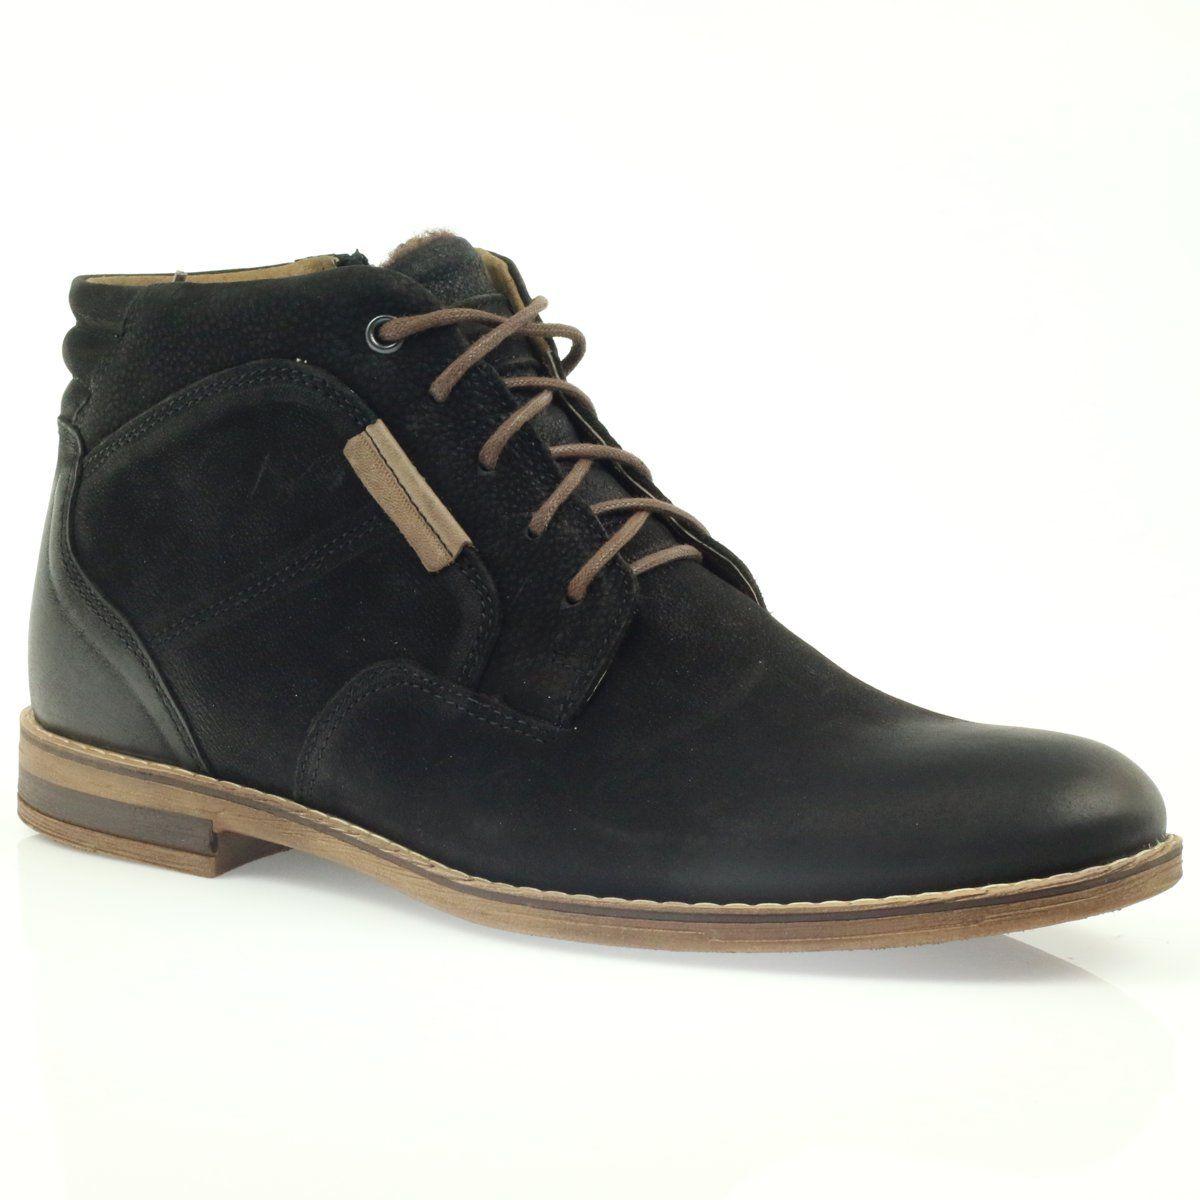 Sztyblety Meskie Riko Botki Sztyblety Na Suwak Riko Czarne Chukka Boots Boots Shoes